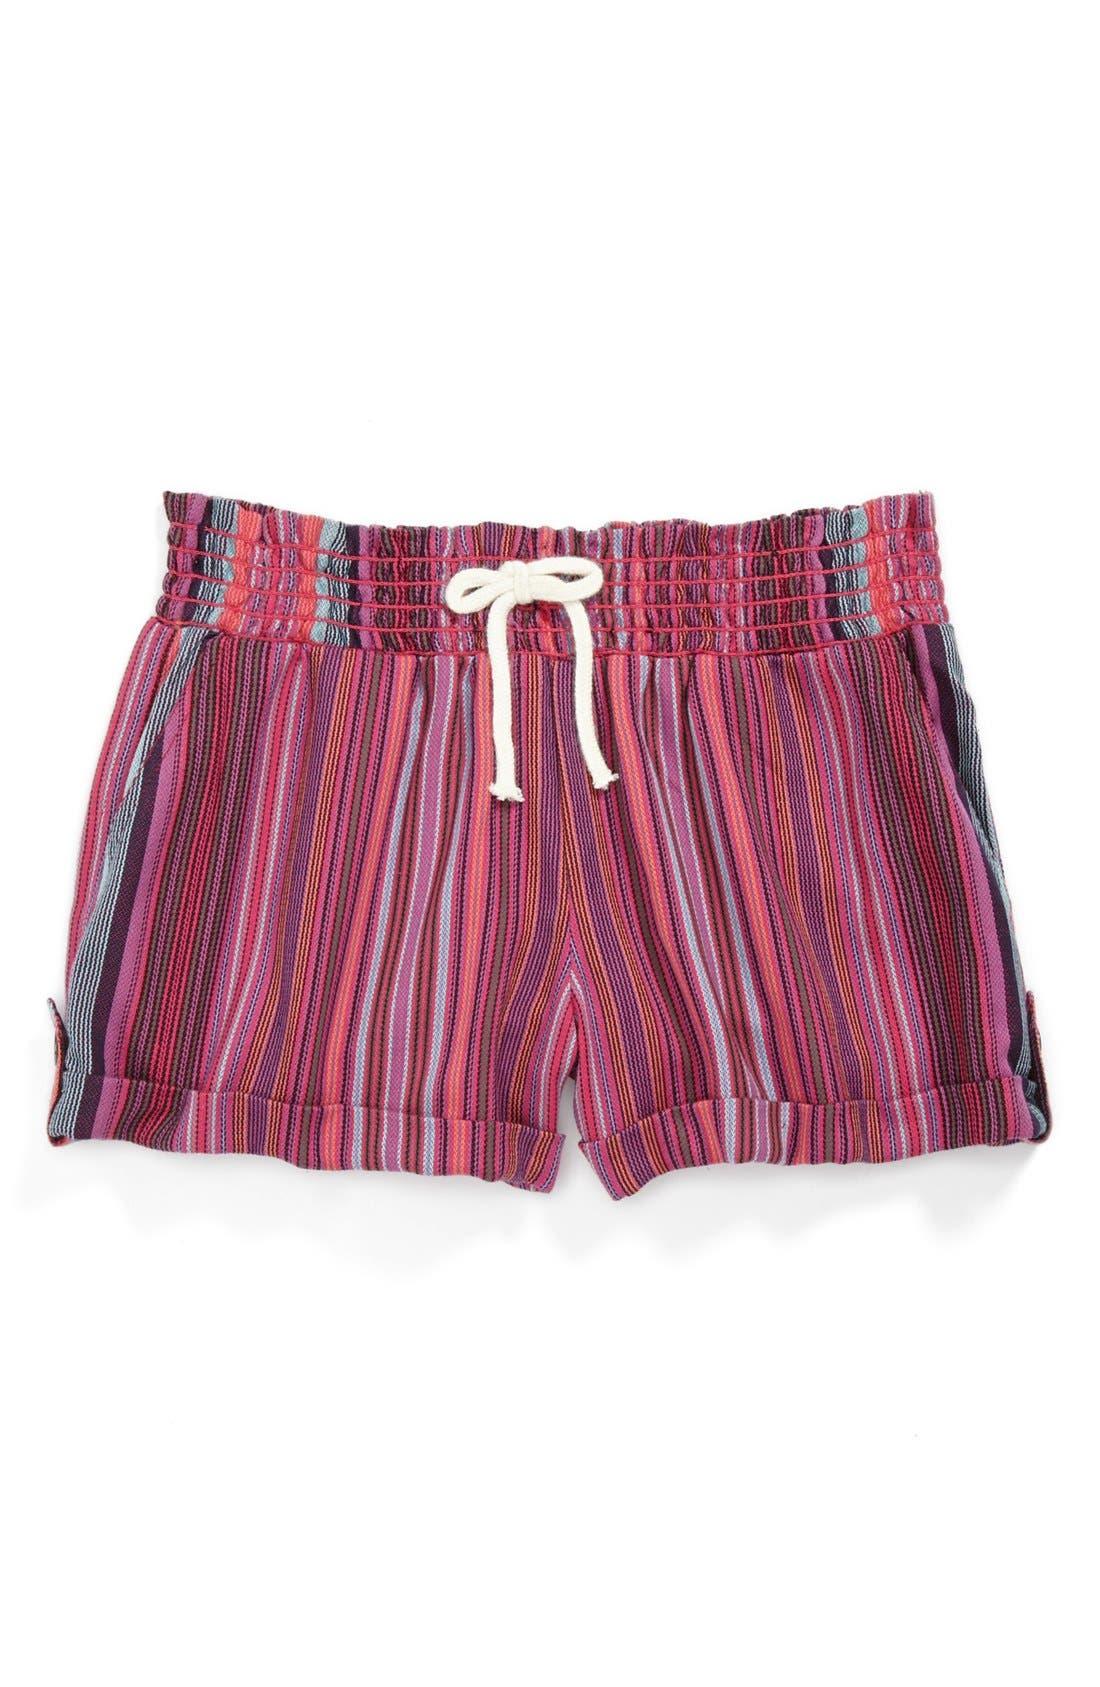 Main Image - Roxy 'Beach Comber' Yarn Dye Shorts (Big Girls)